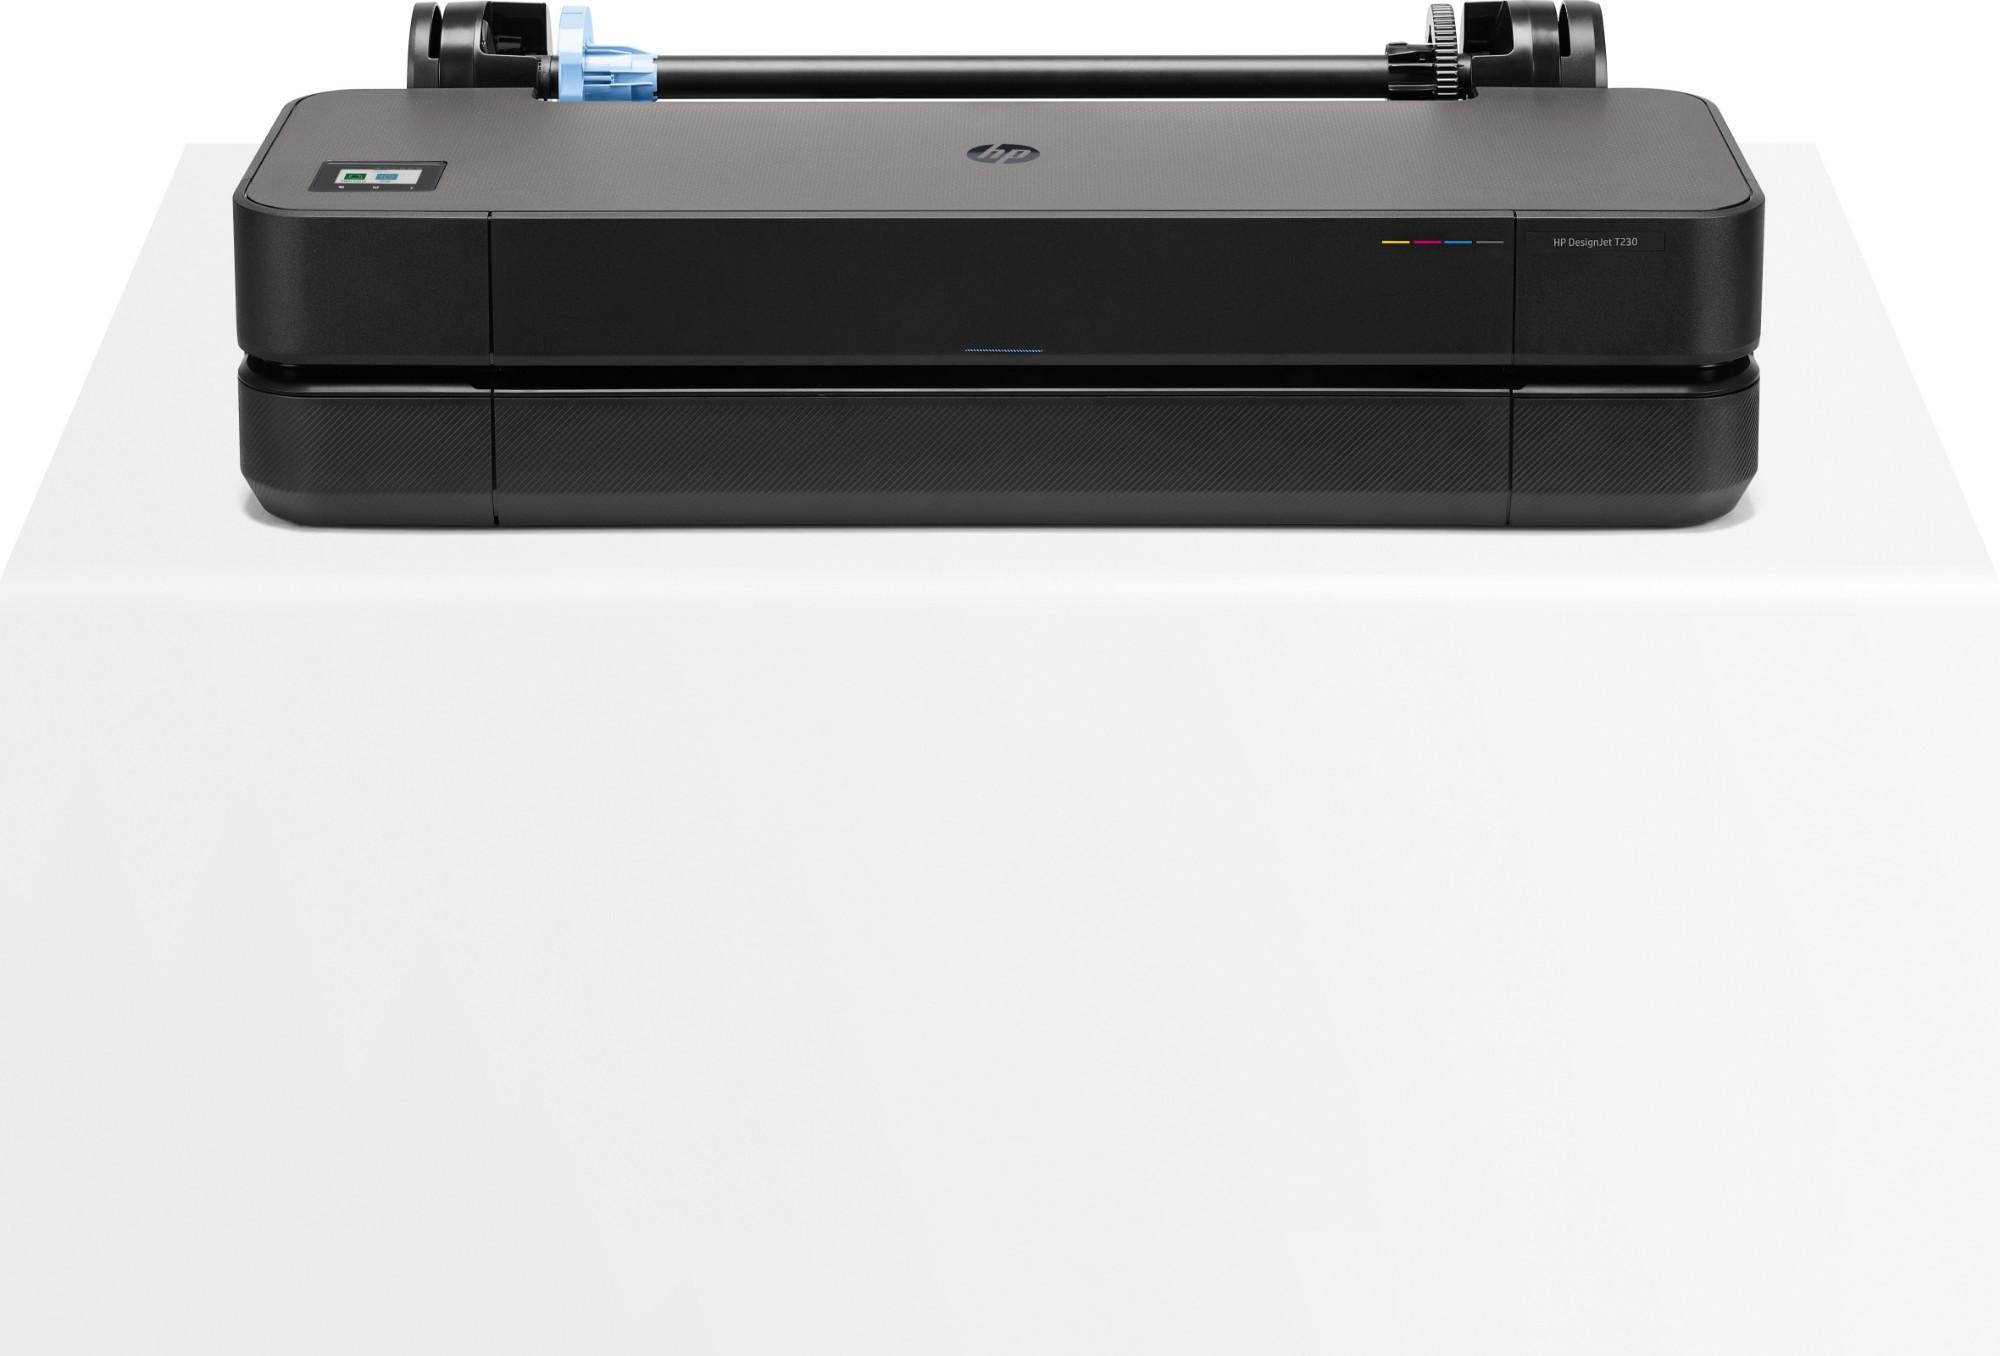 HP Designjet T230 impresora de gran formato Inyección de tinta térmica Color 2400 x 1200 DPI A1 (594 x 841 mm) Ethernet Wifi